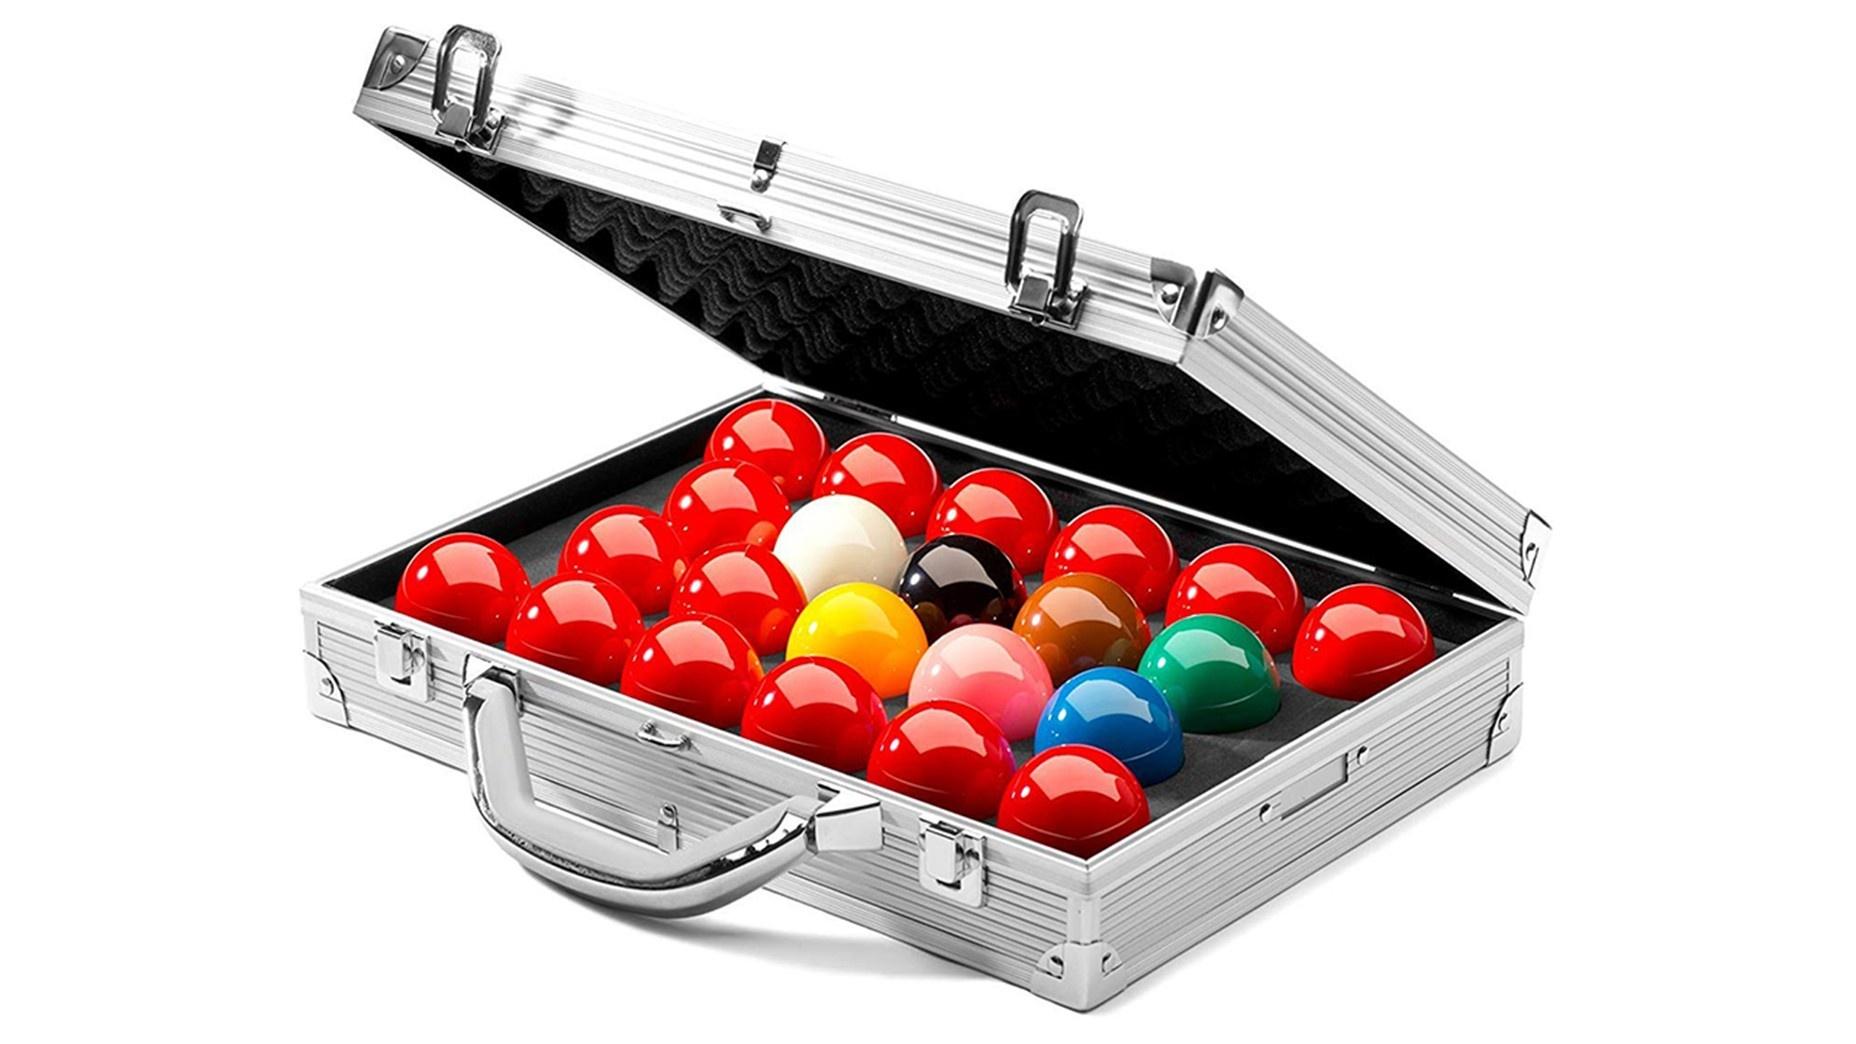 Aramith 1G Tournament Snooker Balls